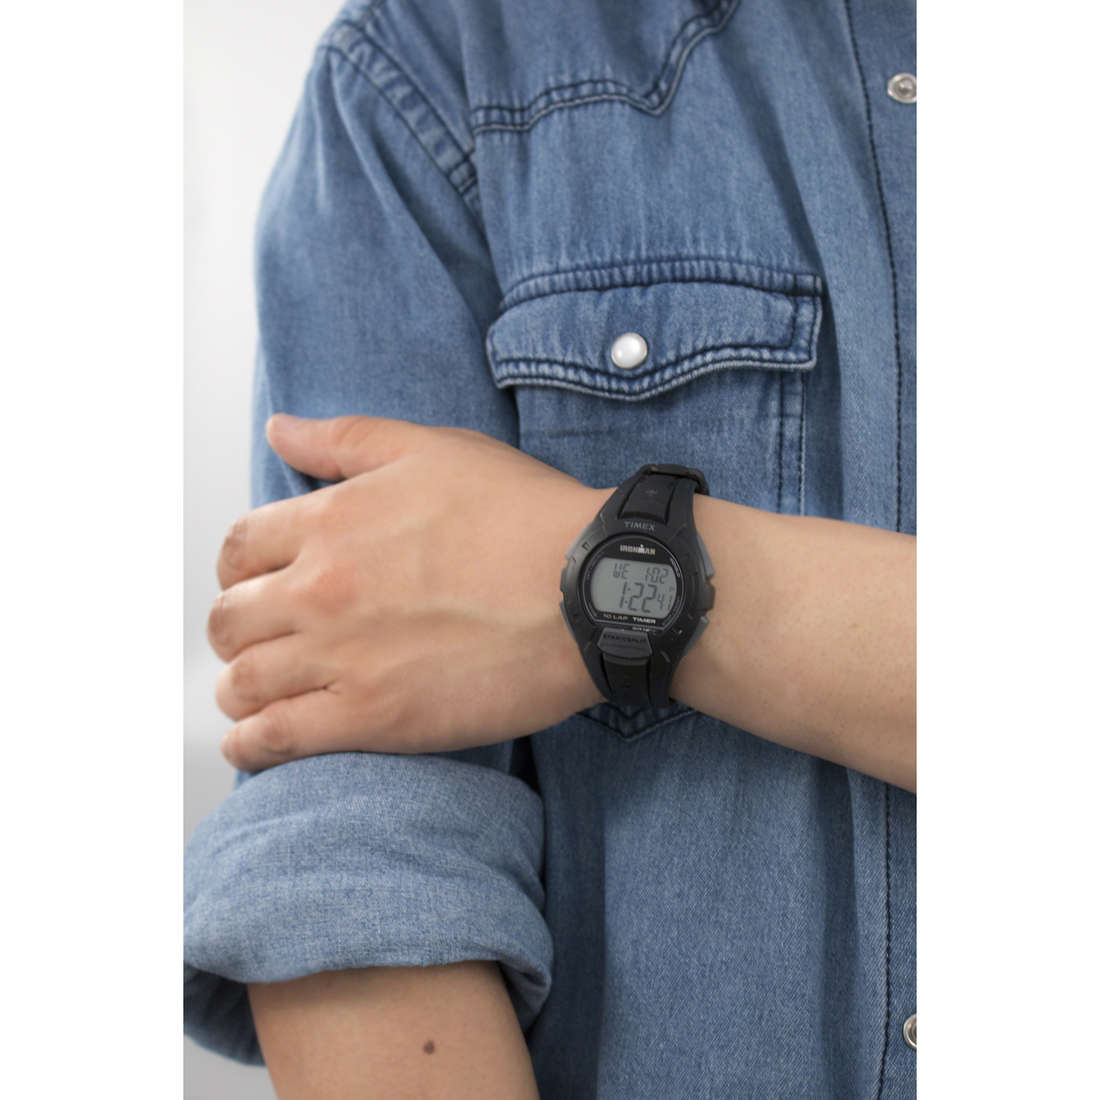 Timex digitals Irm 10 Lap man TW5K94000 indosso